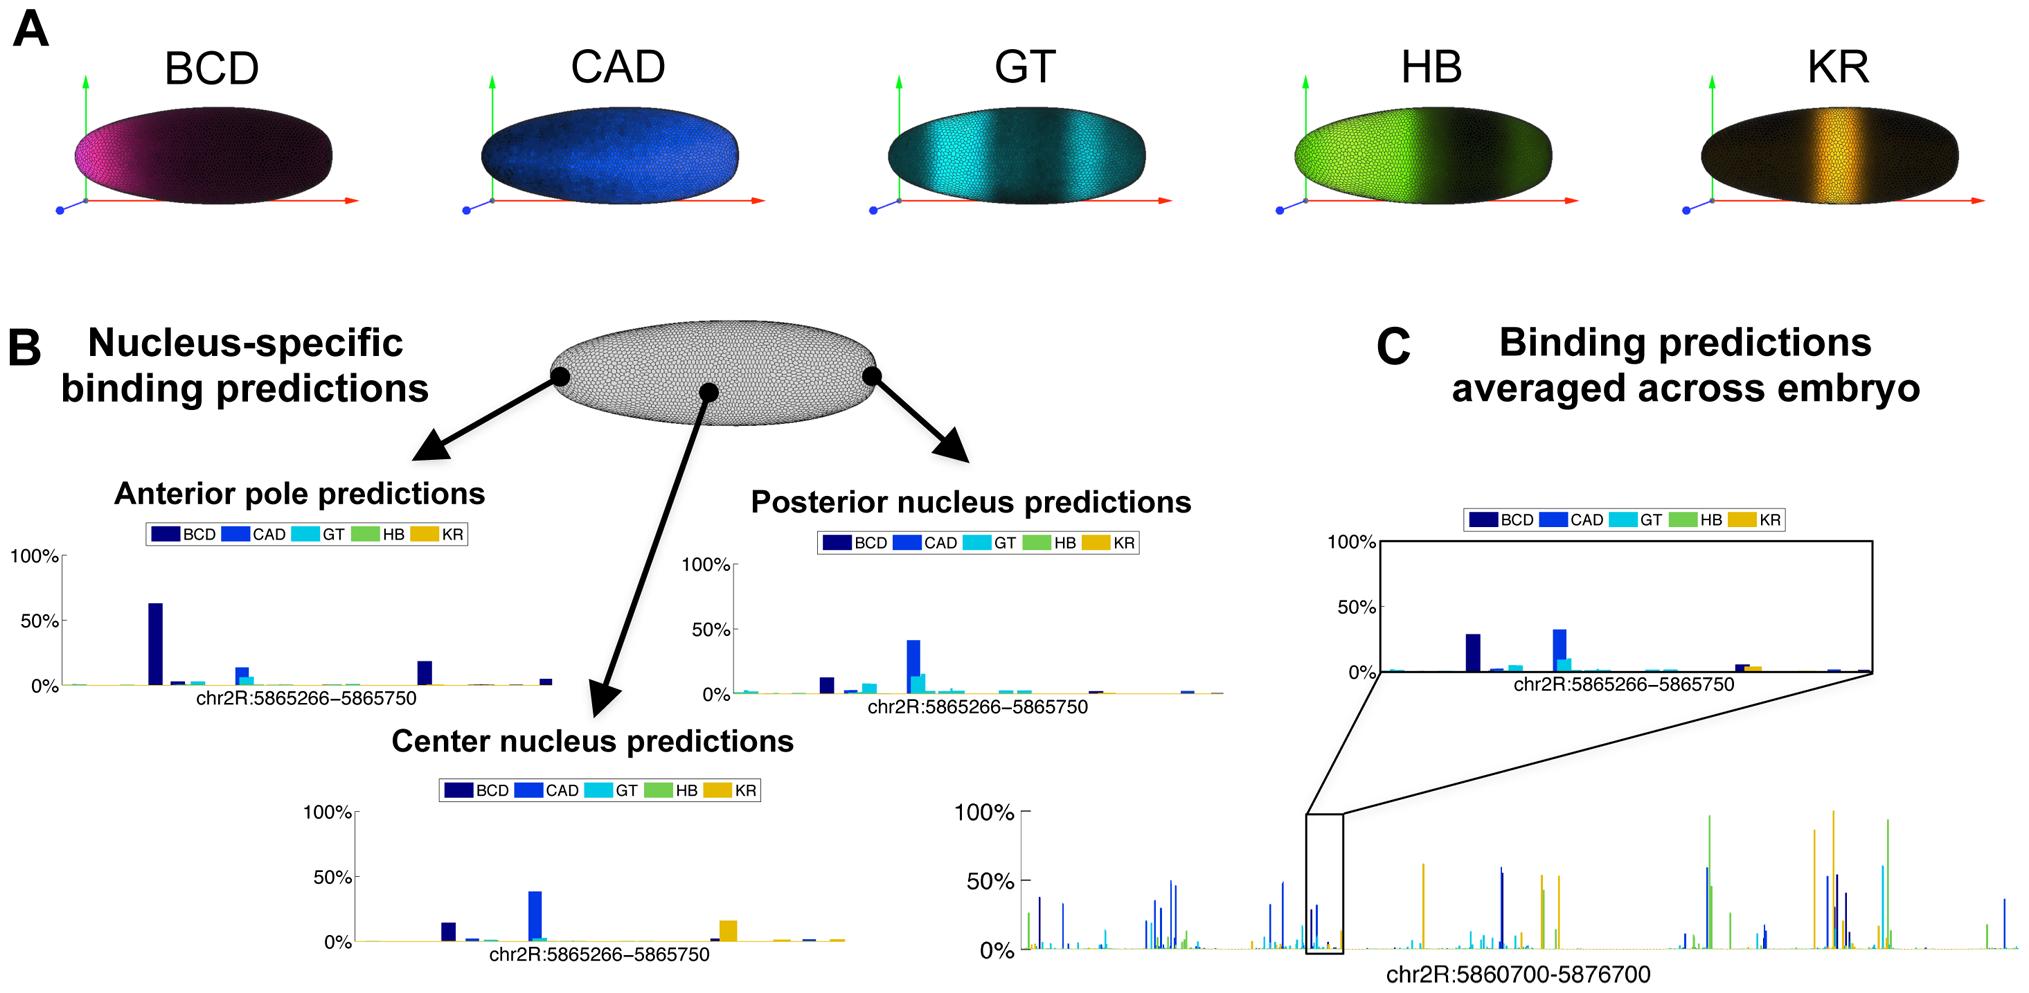 Predicting binding in single-nucleus resolution.